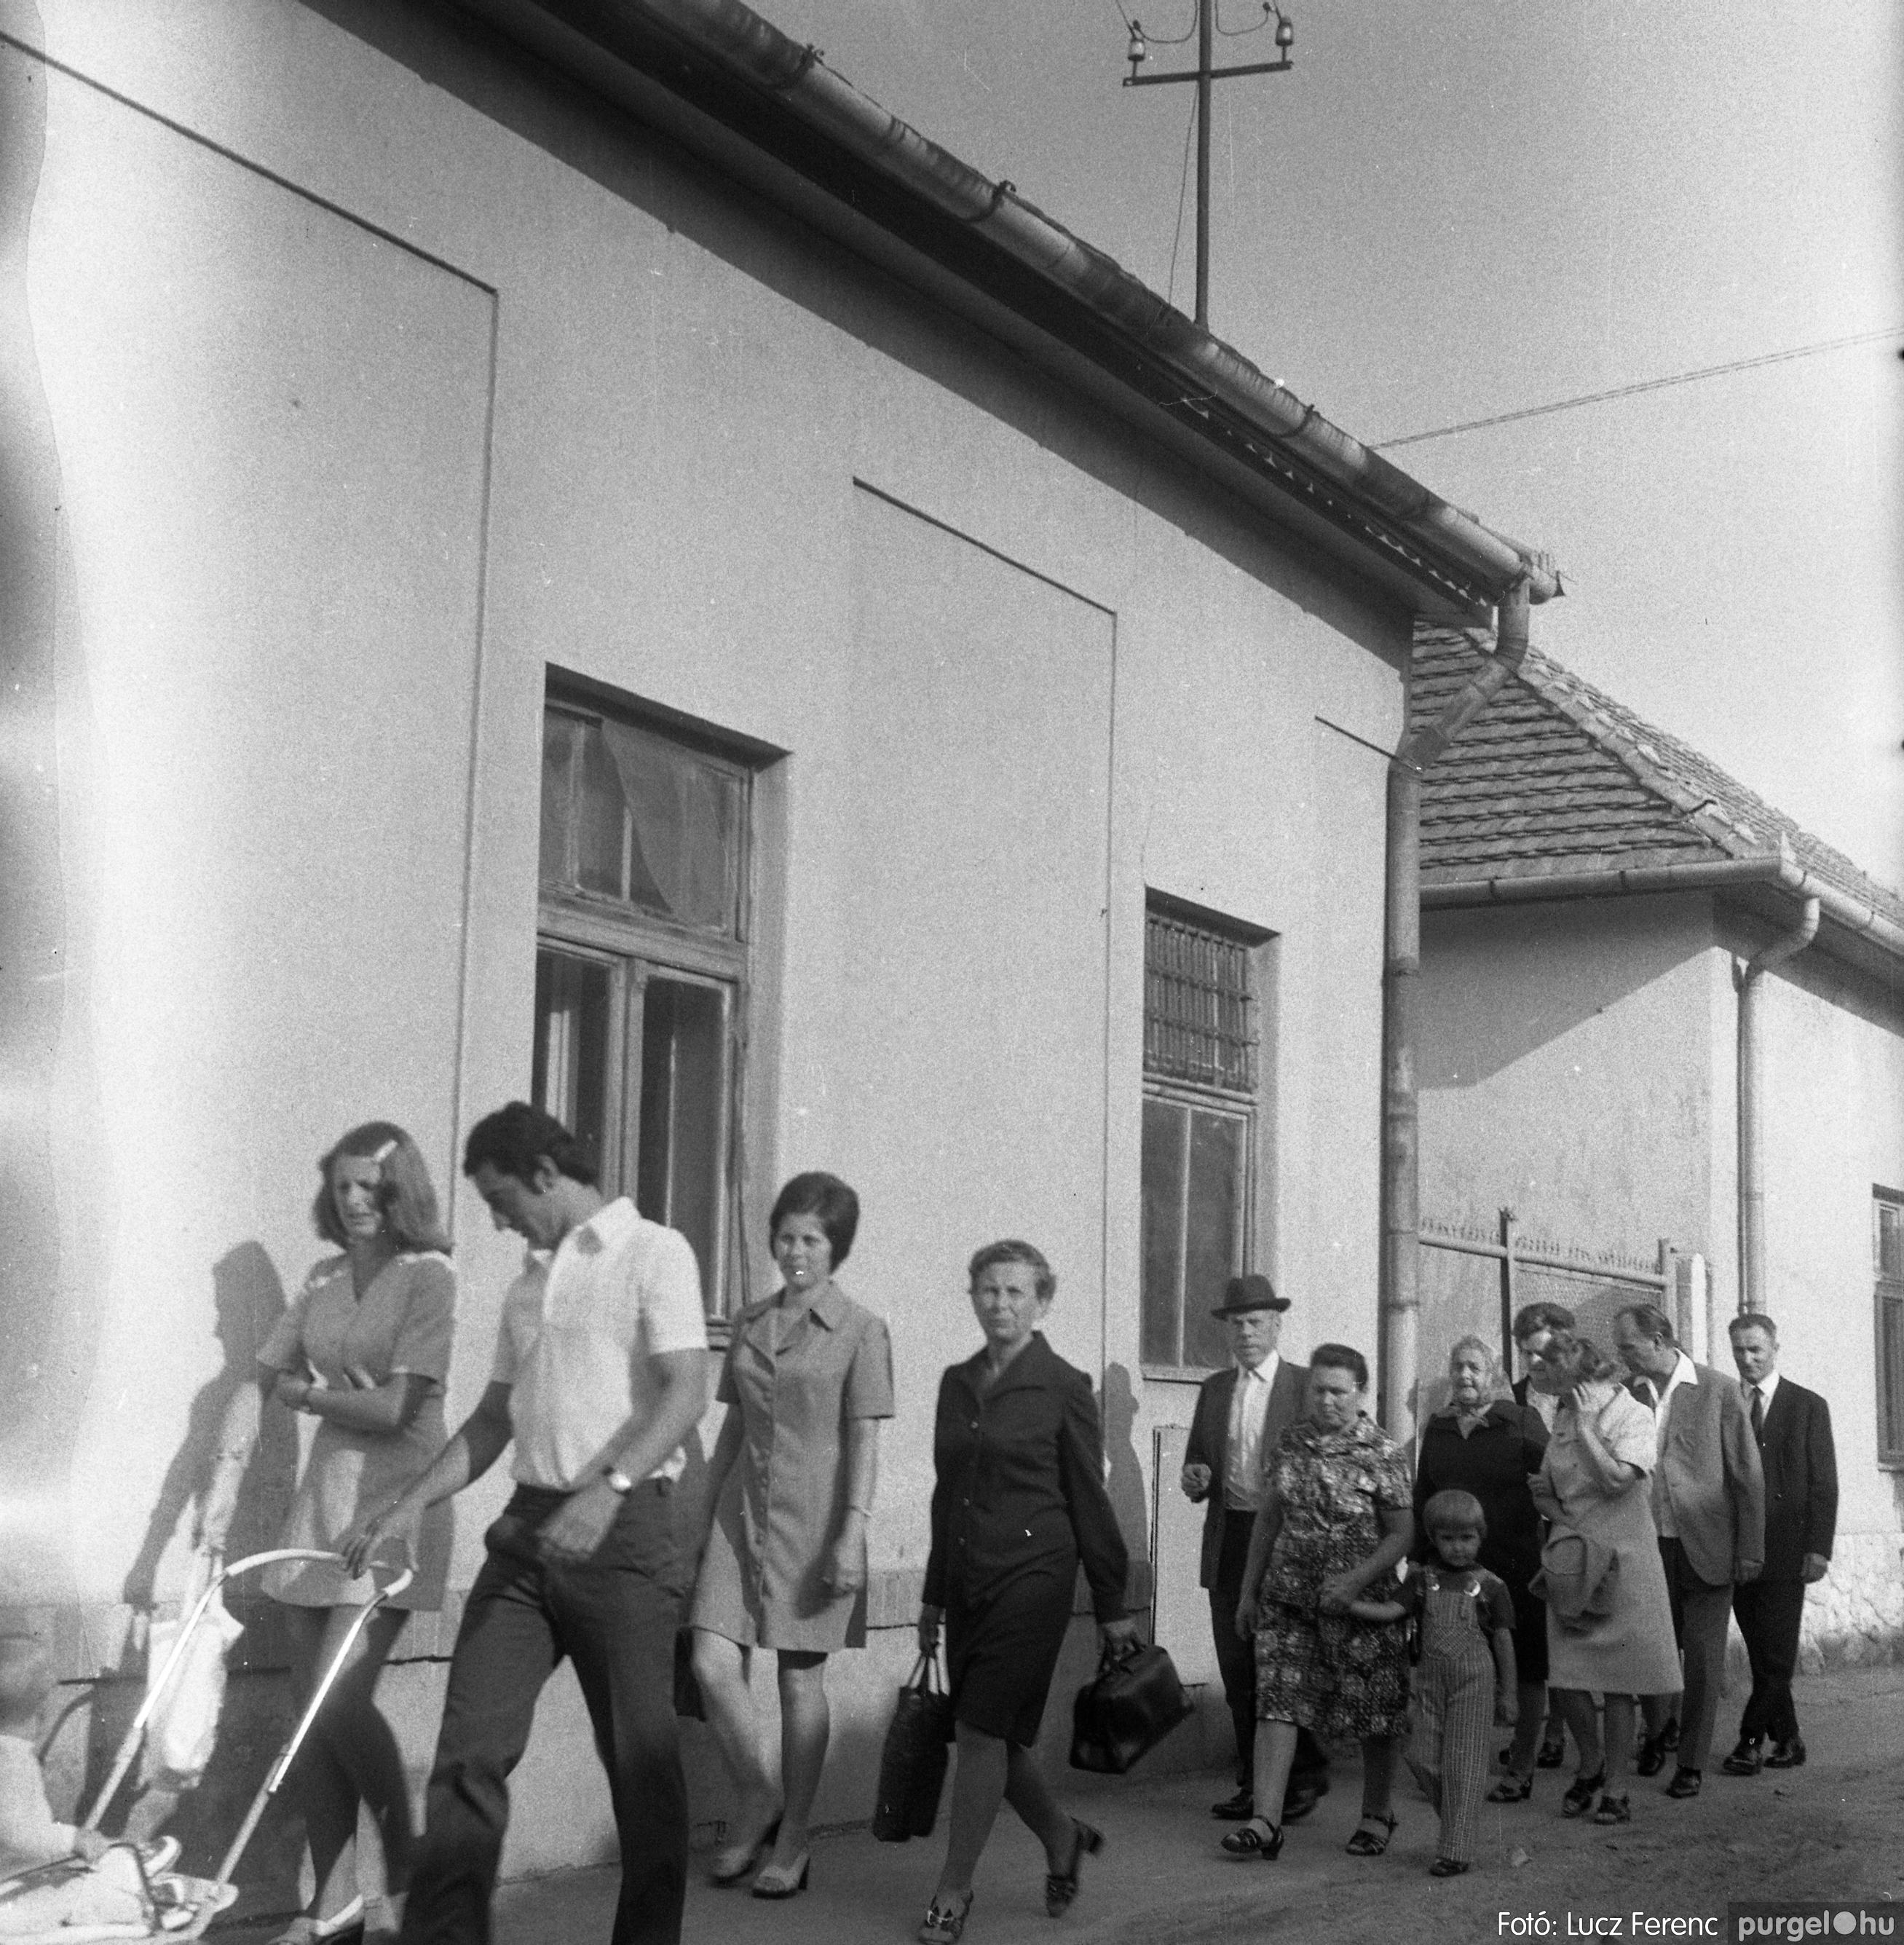 027. 1975. Buli a kultúrban 014. - Fotó: Lucz Ferenc.jpg